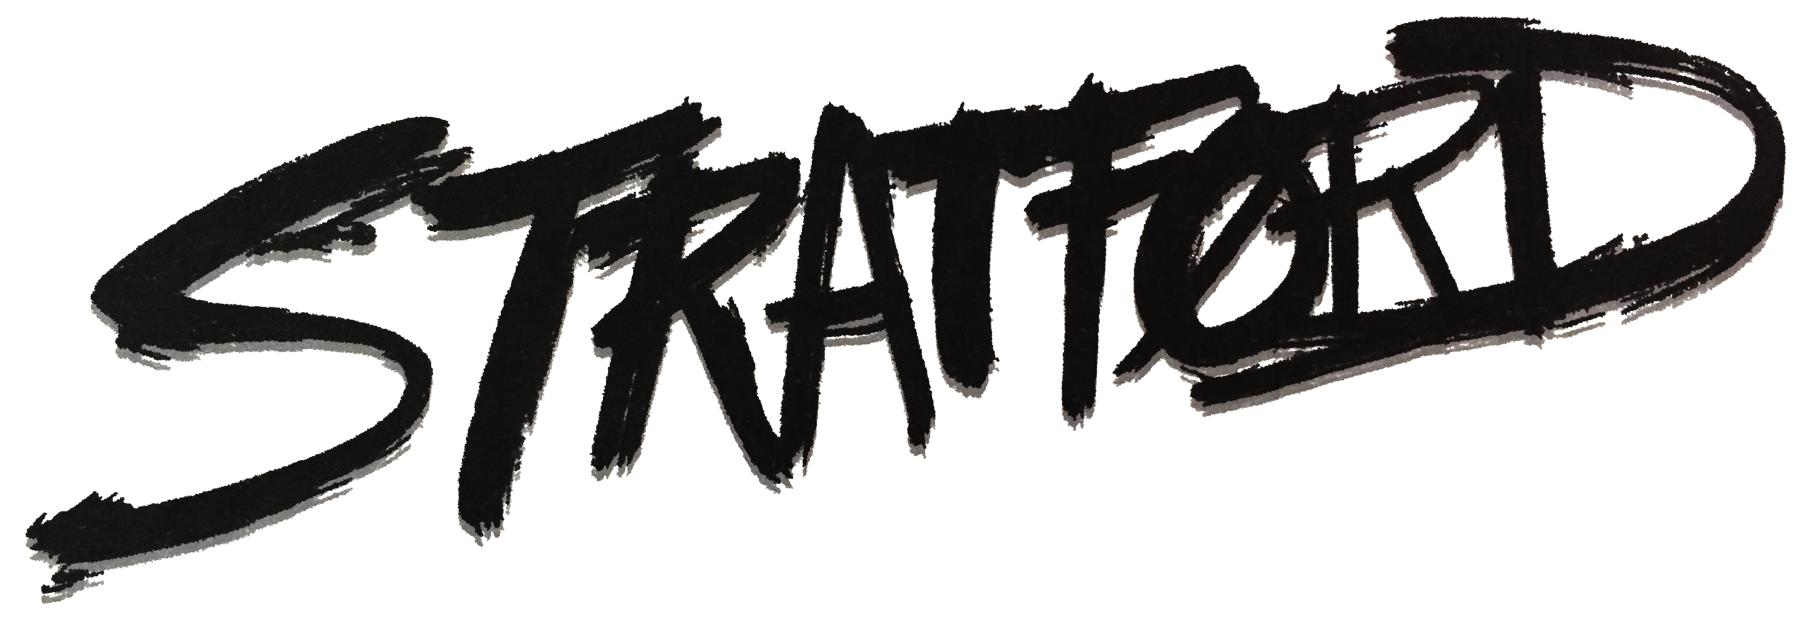 Stratford Black Logo2.png